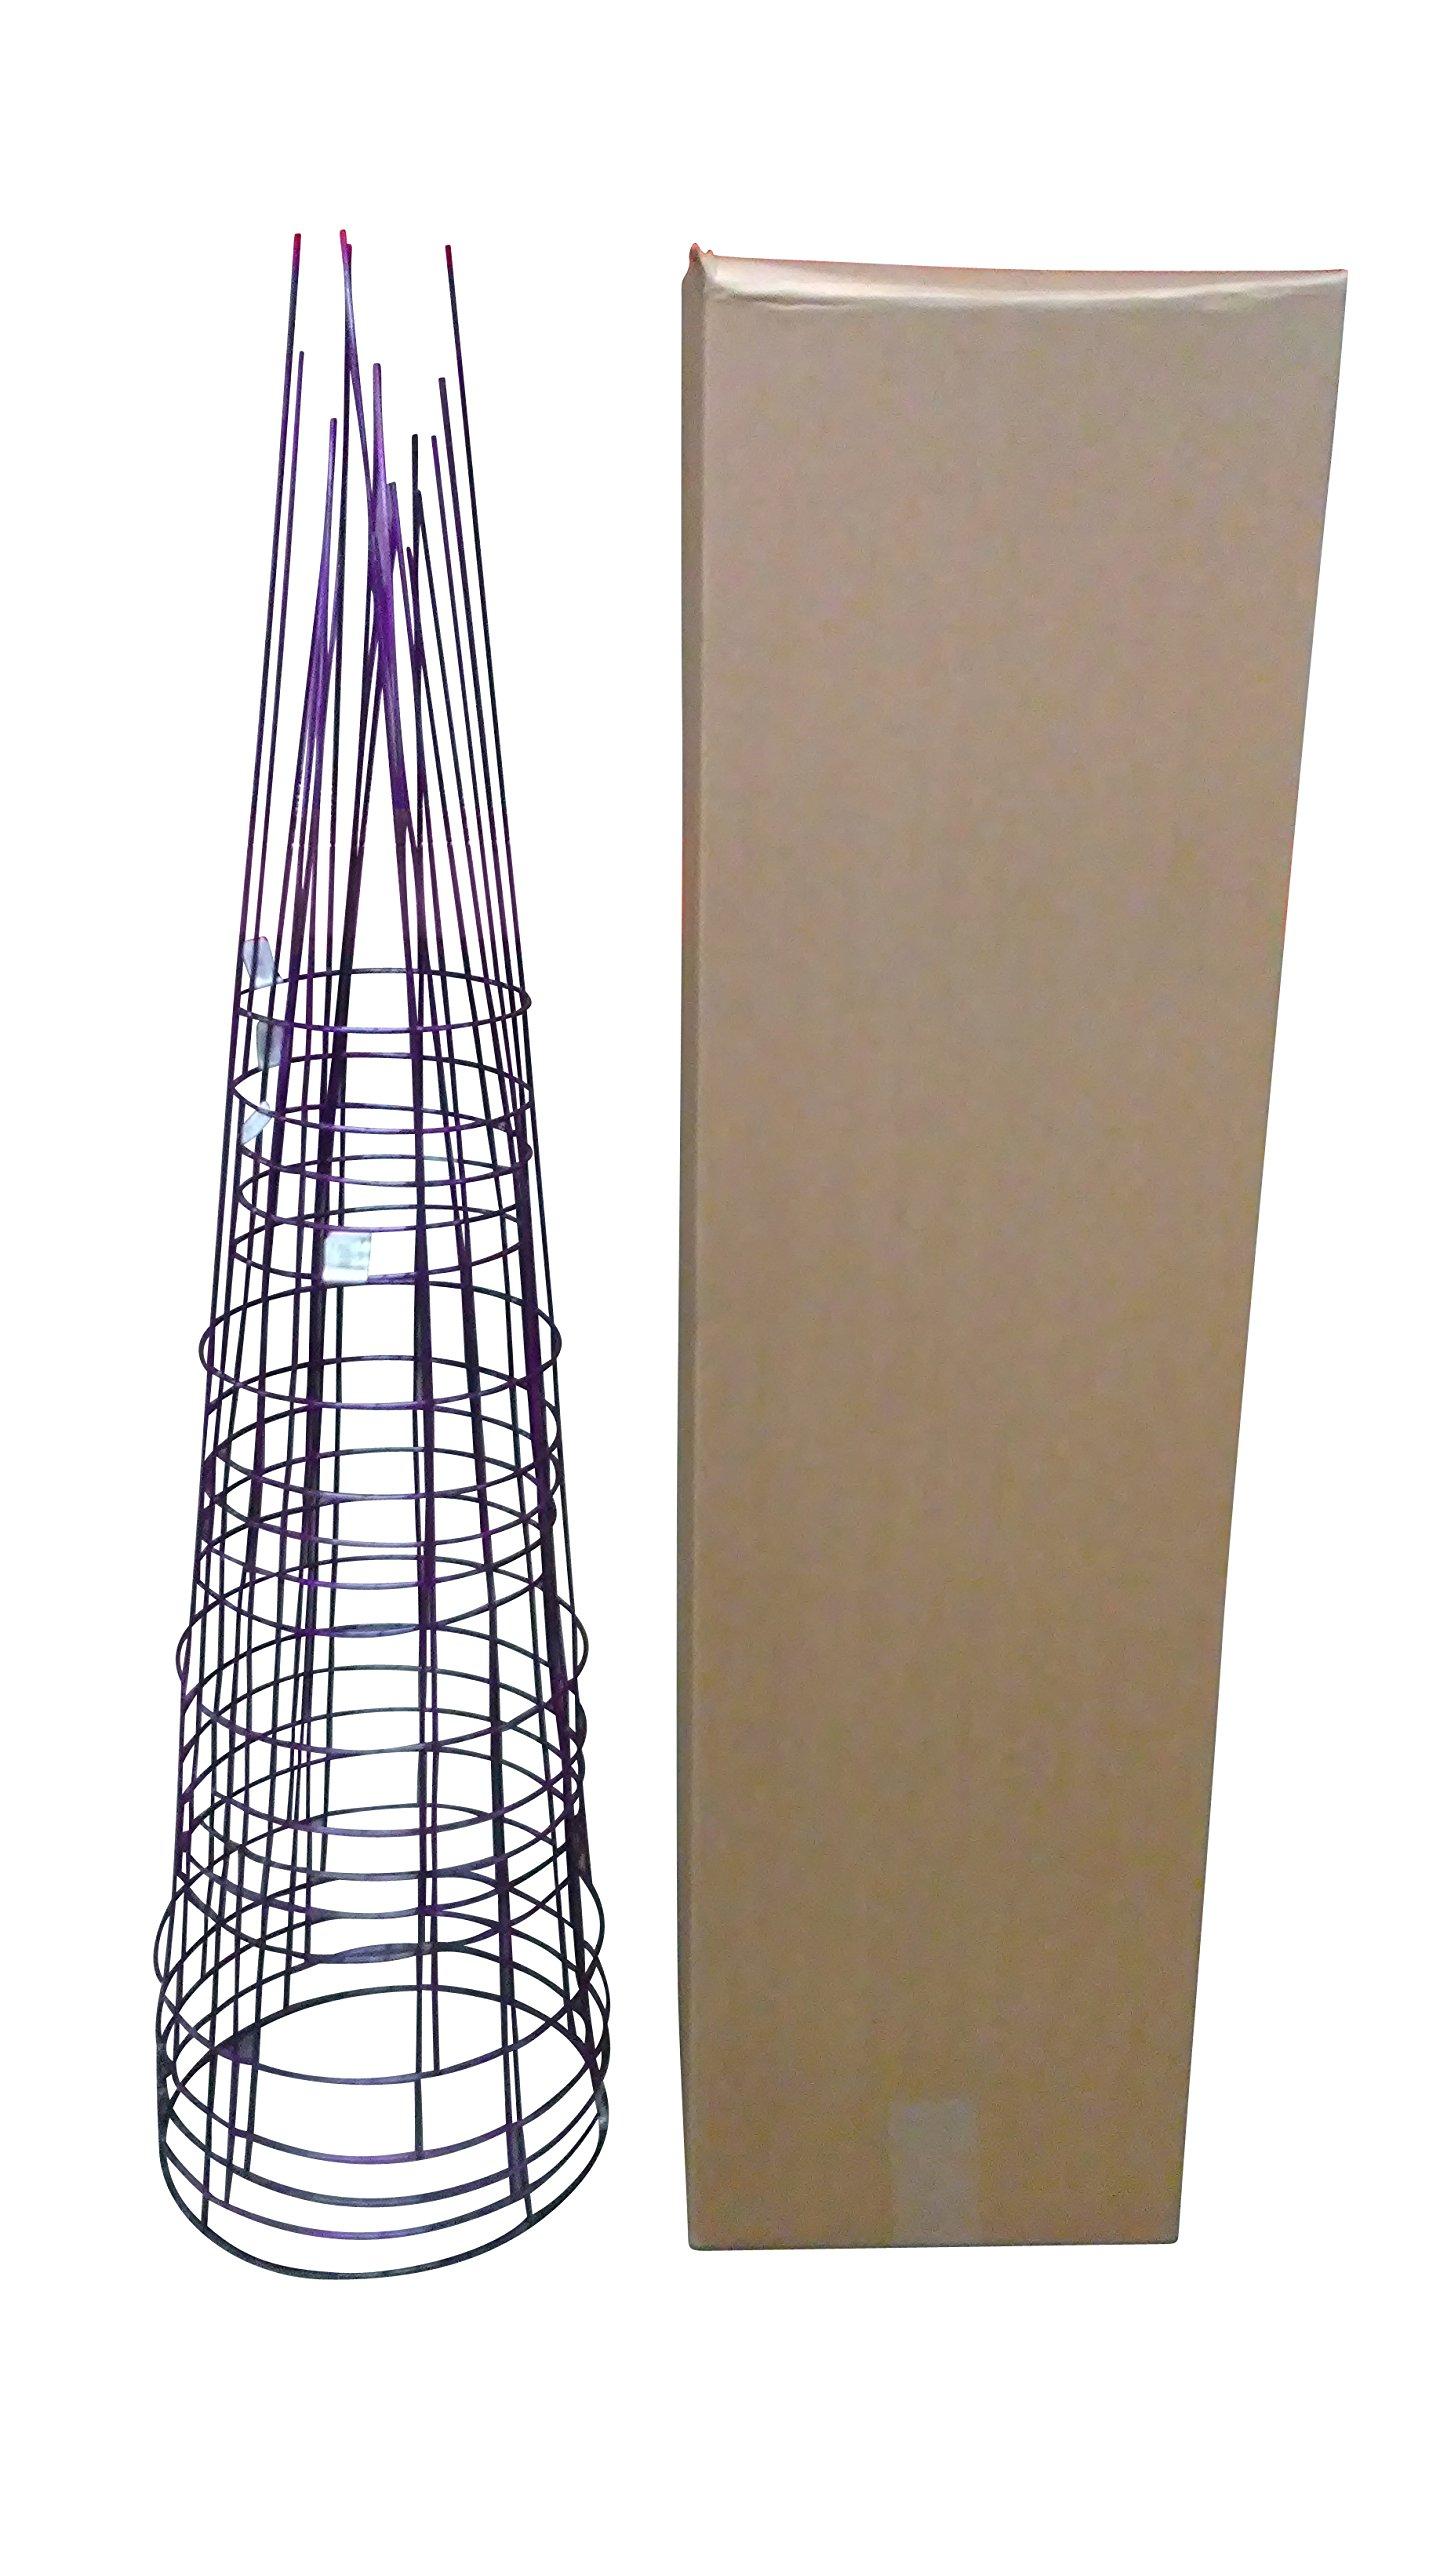 Glamos 286373 Garden Plant Support, Large/16'' x 54'', Amethyst Purple